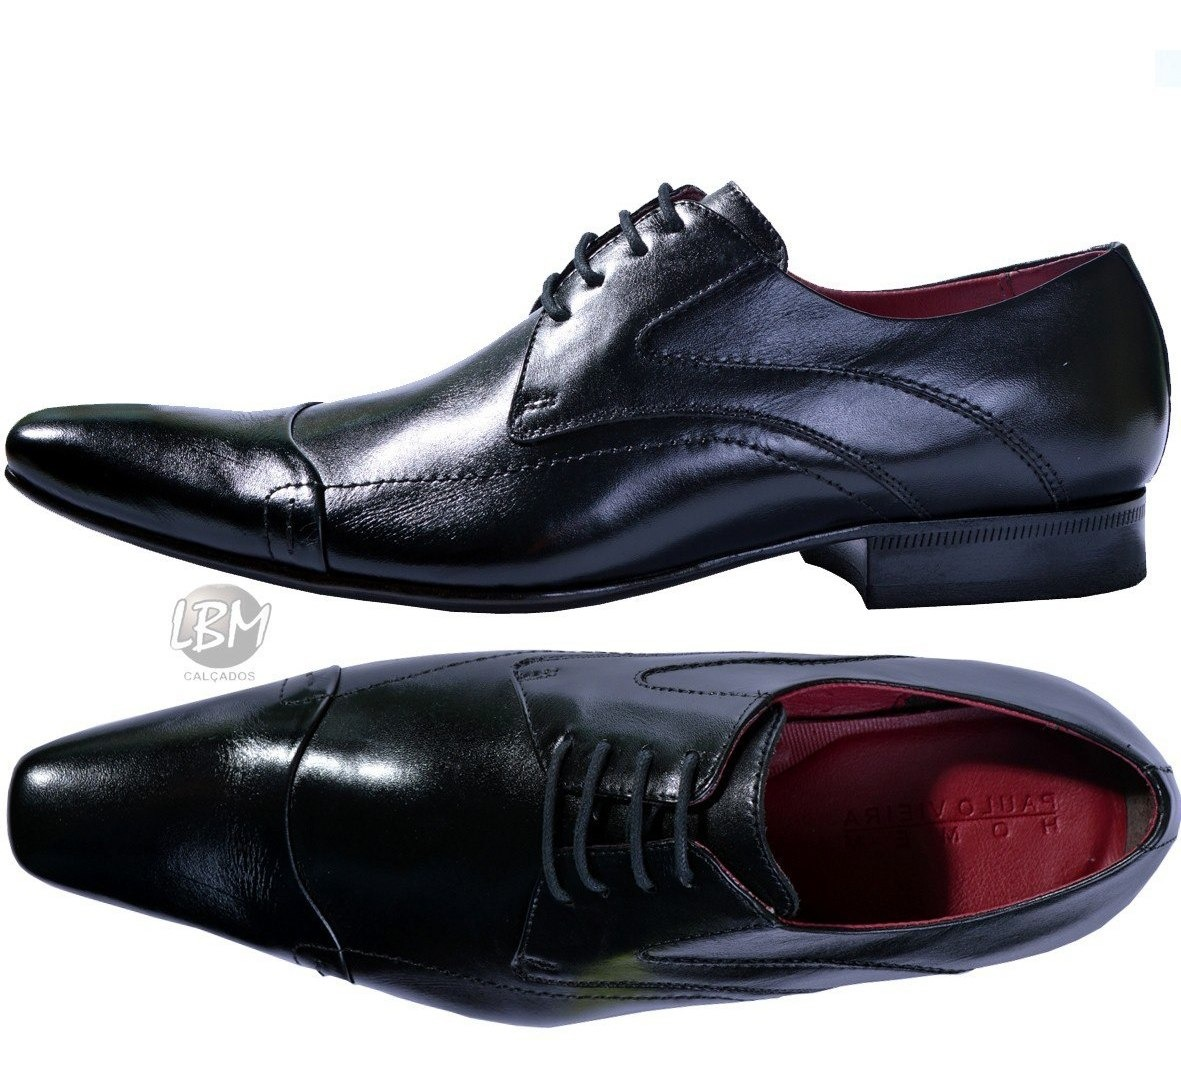 c43700ad3 sapato social masculino italiano lançamento 100% couro aqui. Carregando zoom .